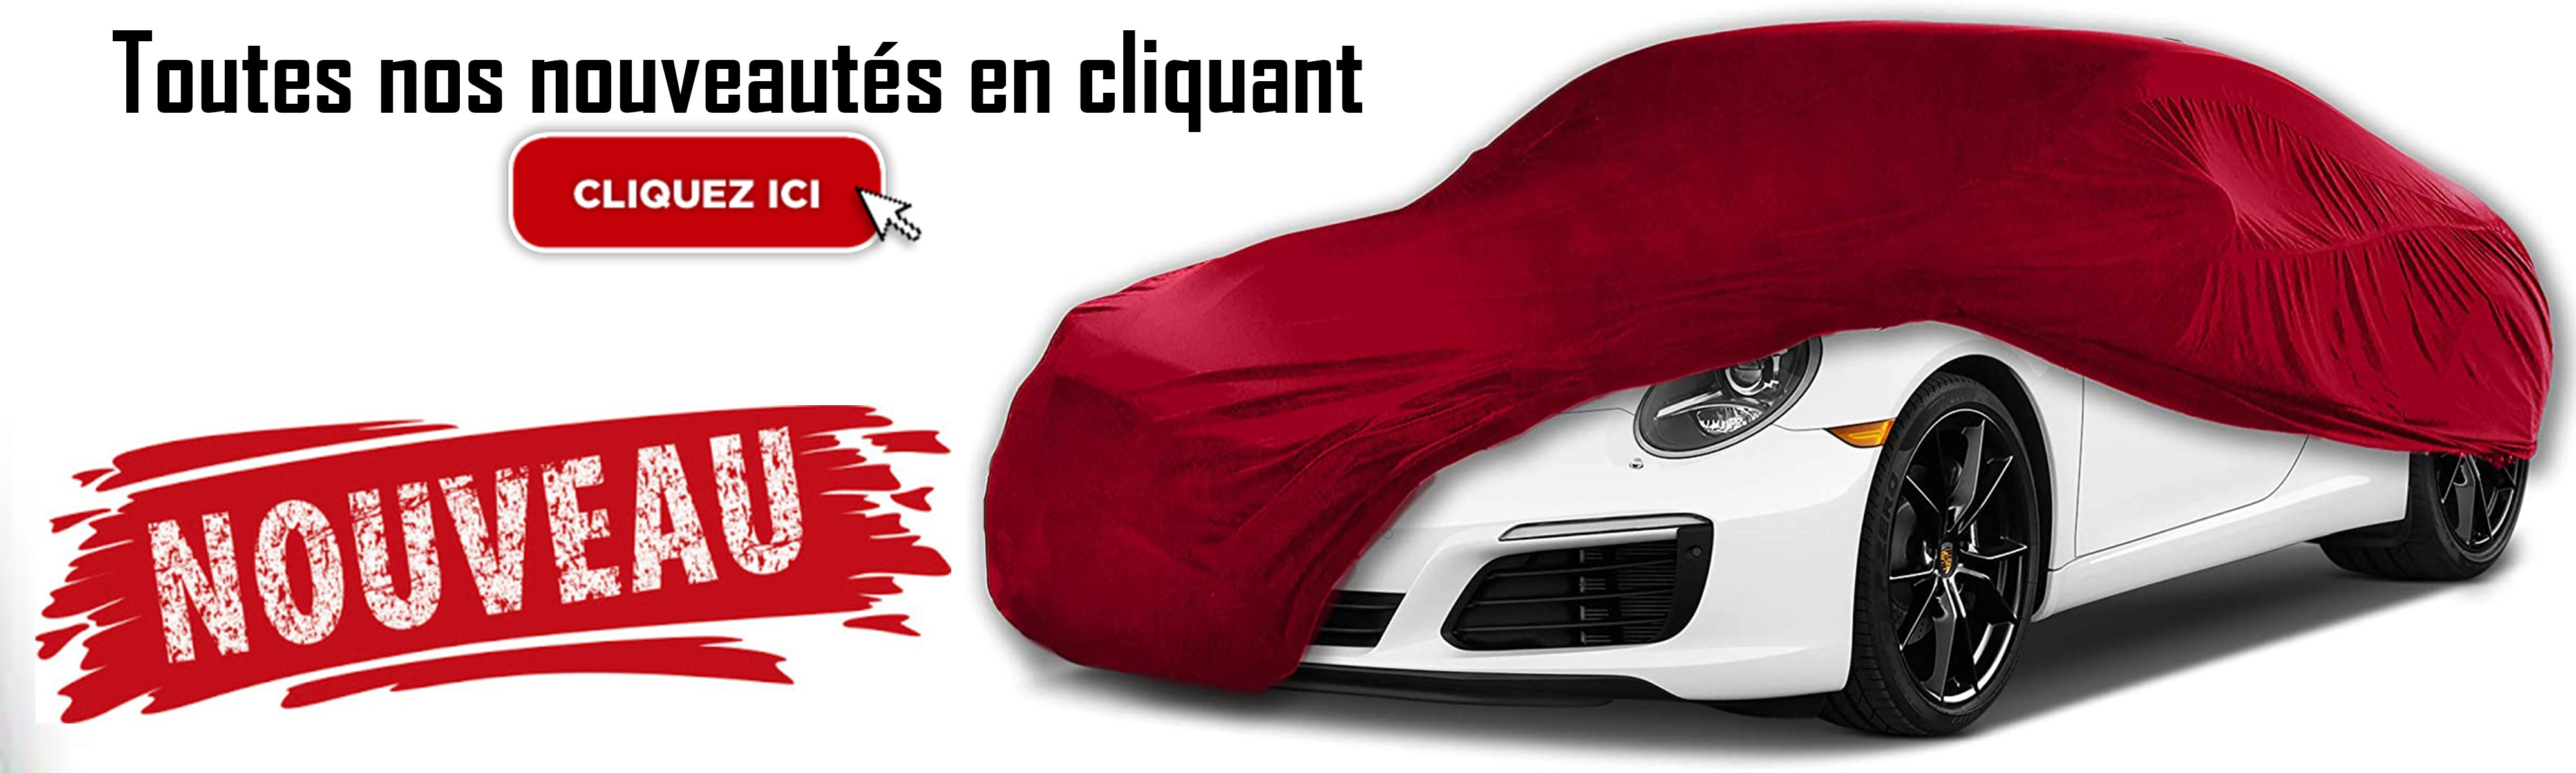 voitures-miniatures-discount-modeles-reduits-diecast-petite-voiture-1.43